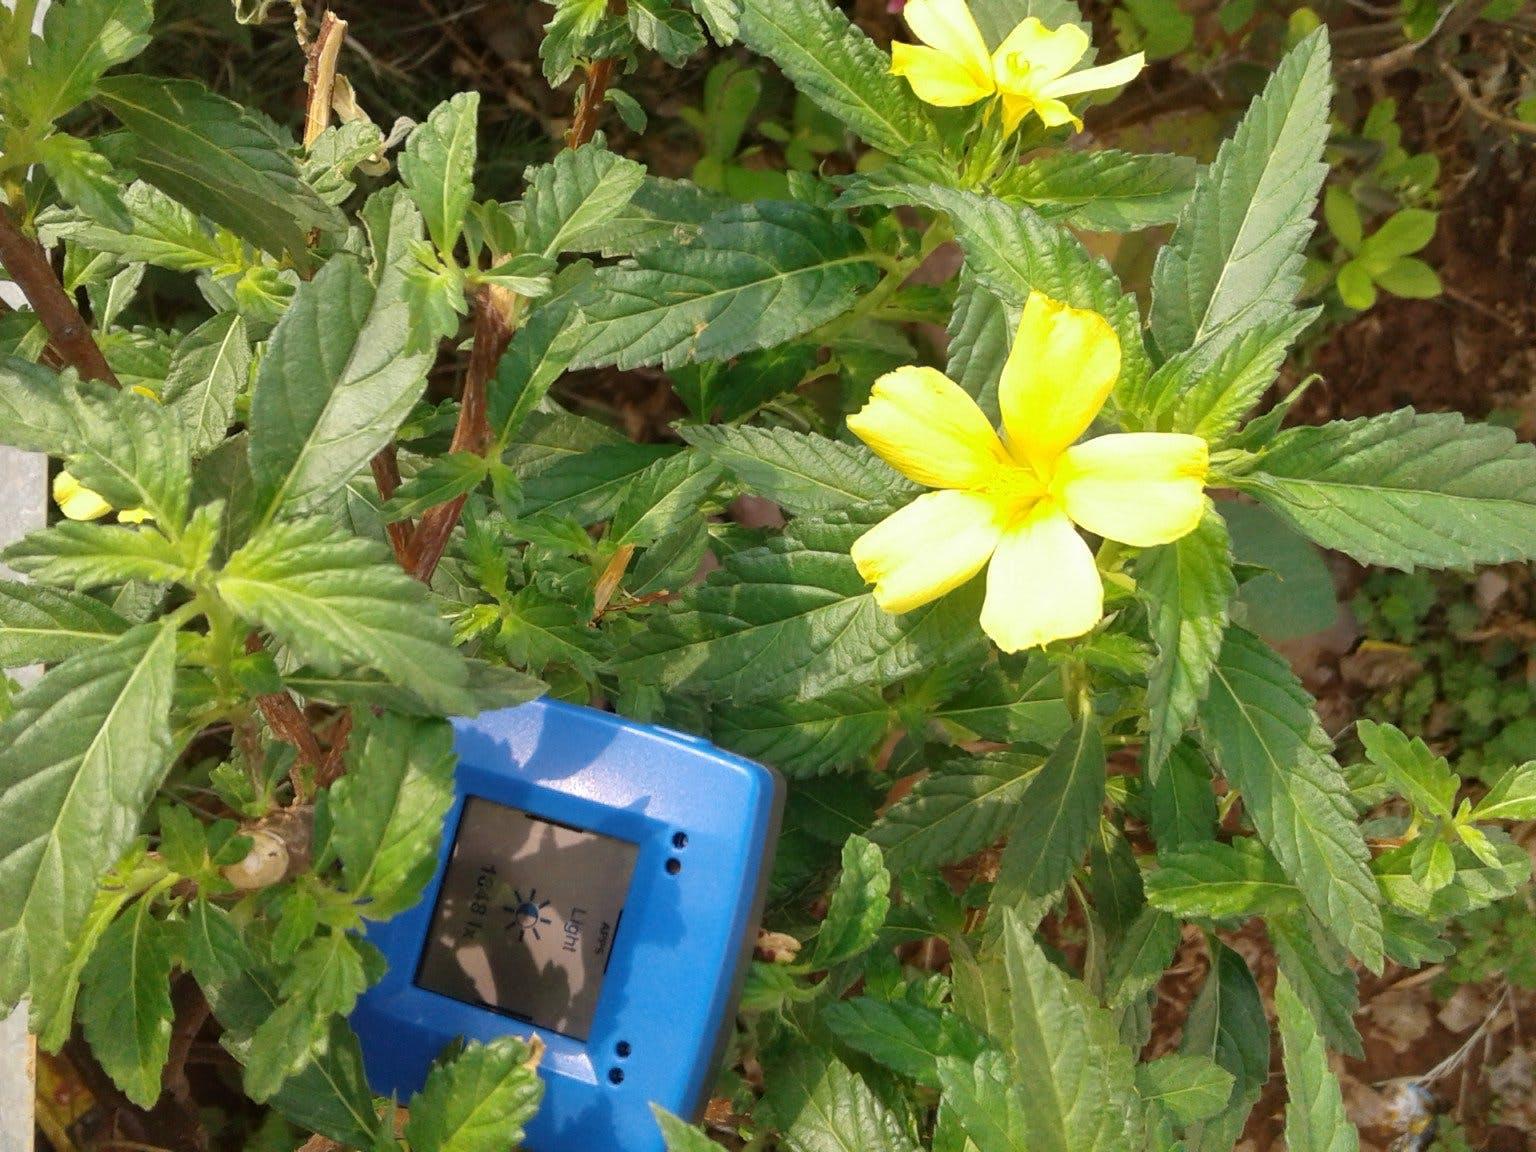 Horticulture environment sensing device